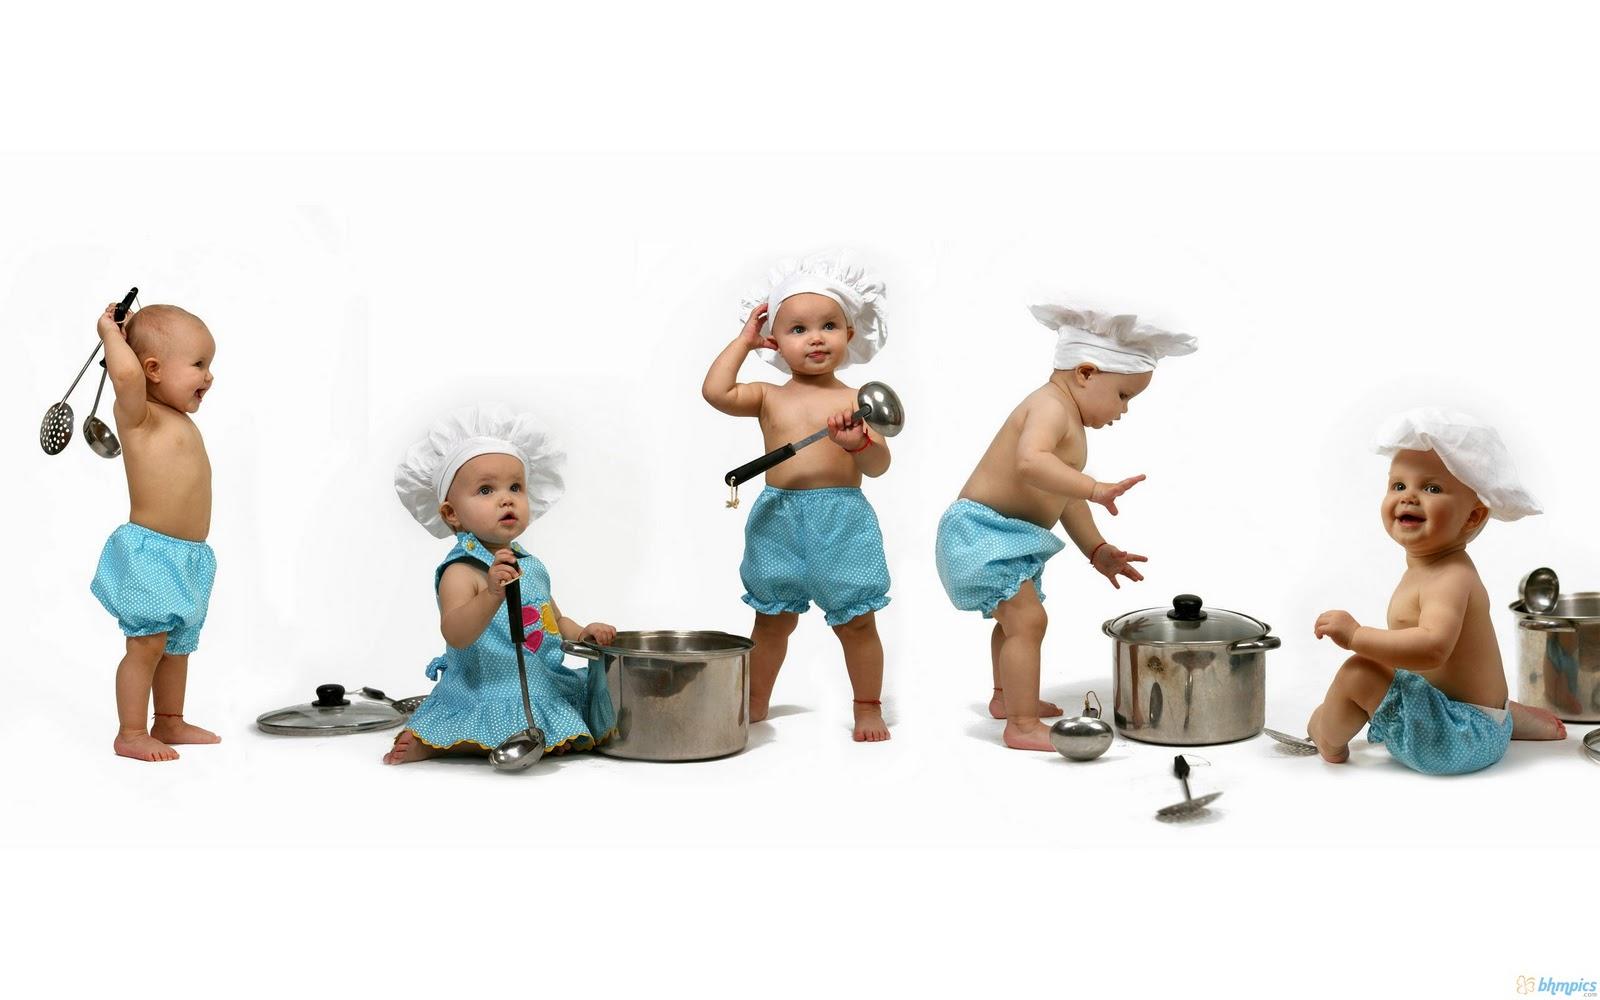 http://1.bp.blogspot.com/-hG5G84QHAWs/Tug5gN3XeNI/AAAAAAAAAas/lVjQMjsMjUo/s1600/babies_in_kitchen-2560x1600.jpg